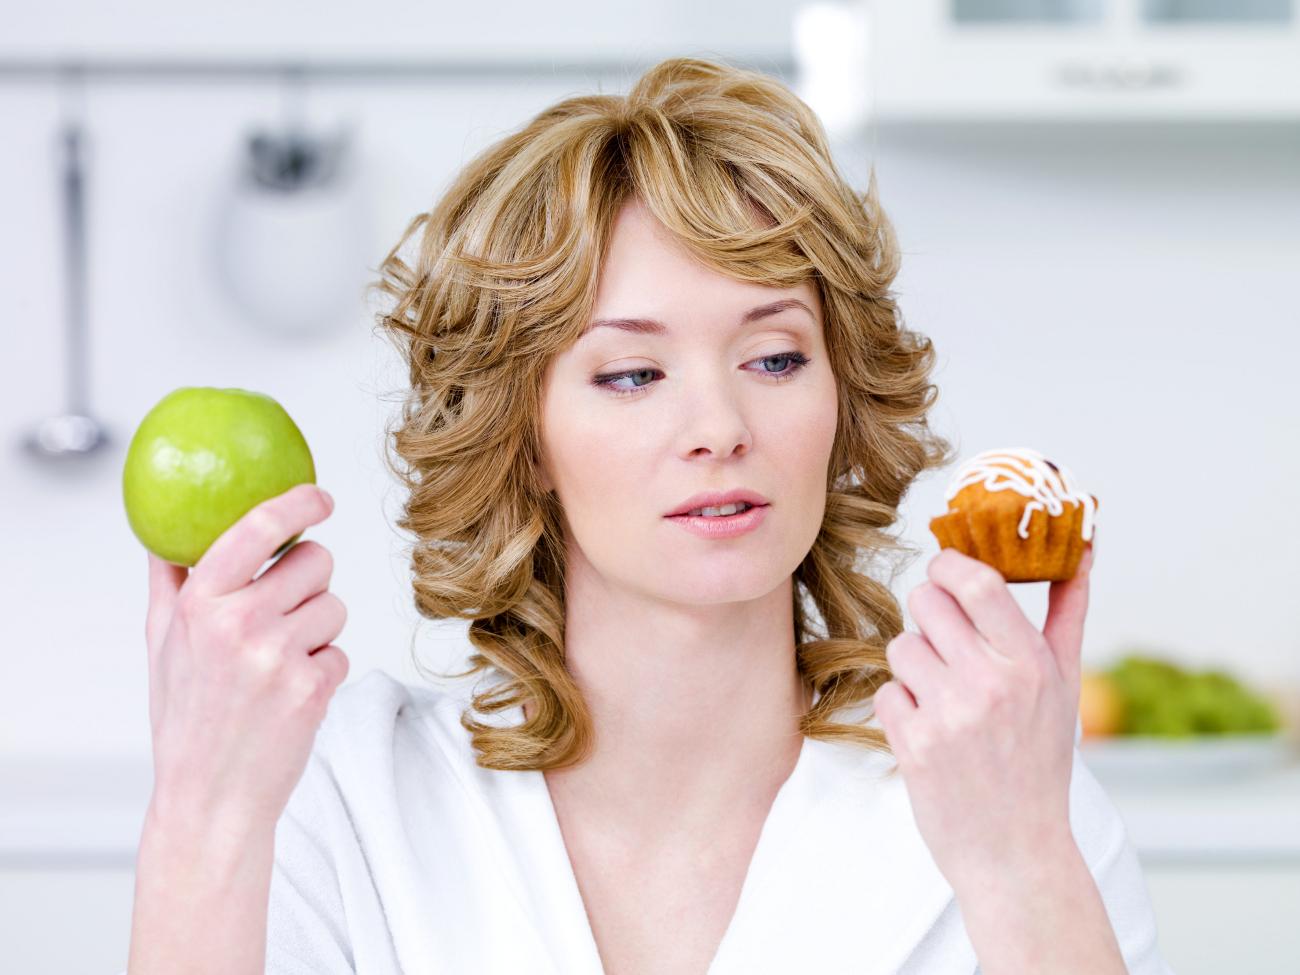 dieta para bajar de peso rapido